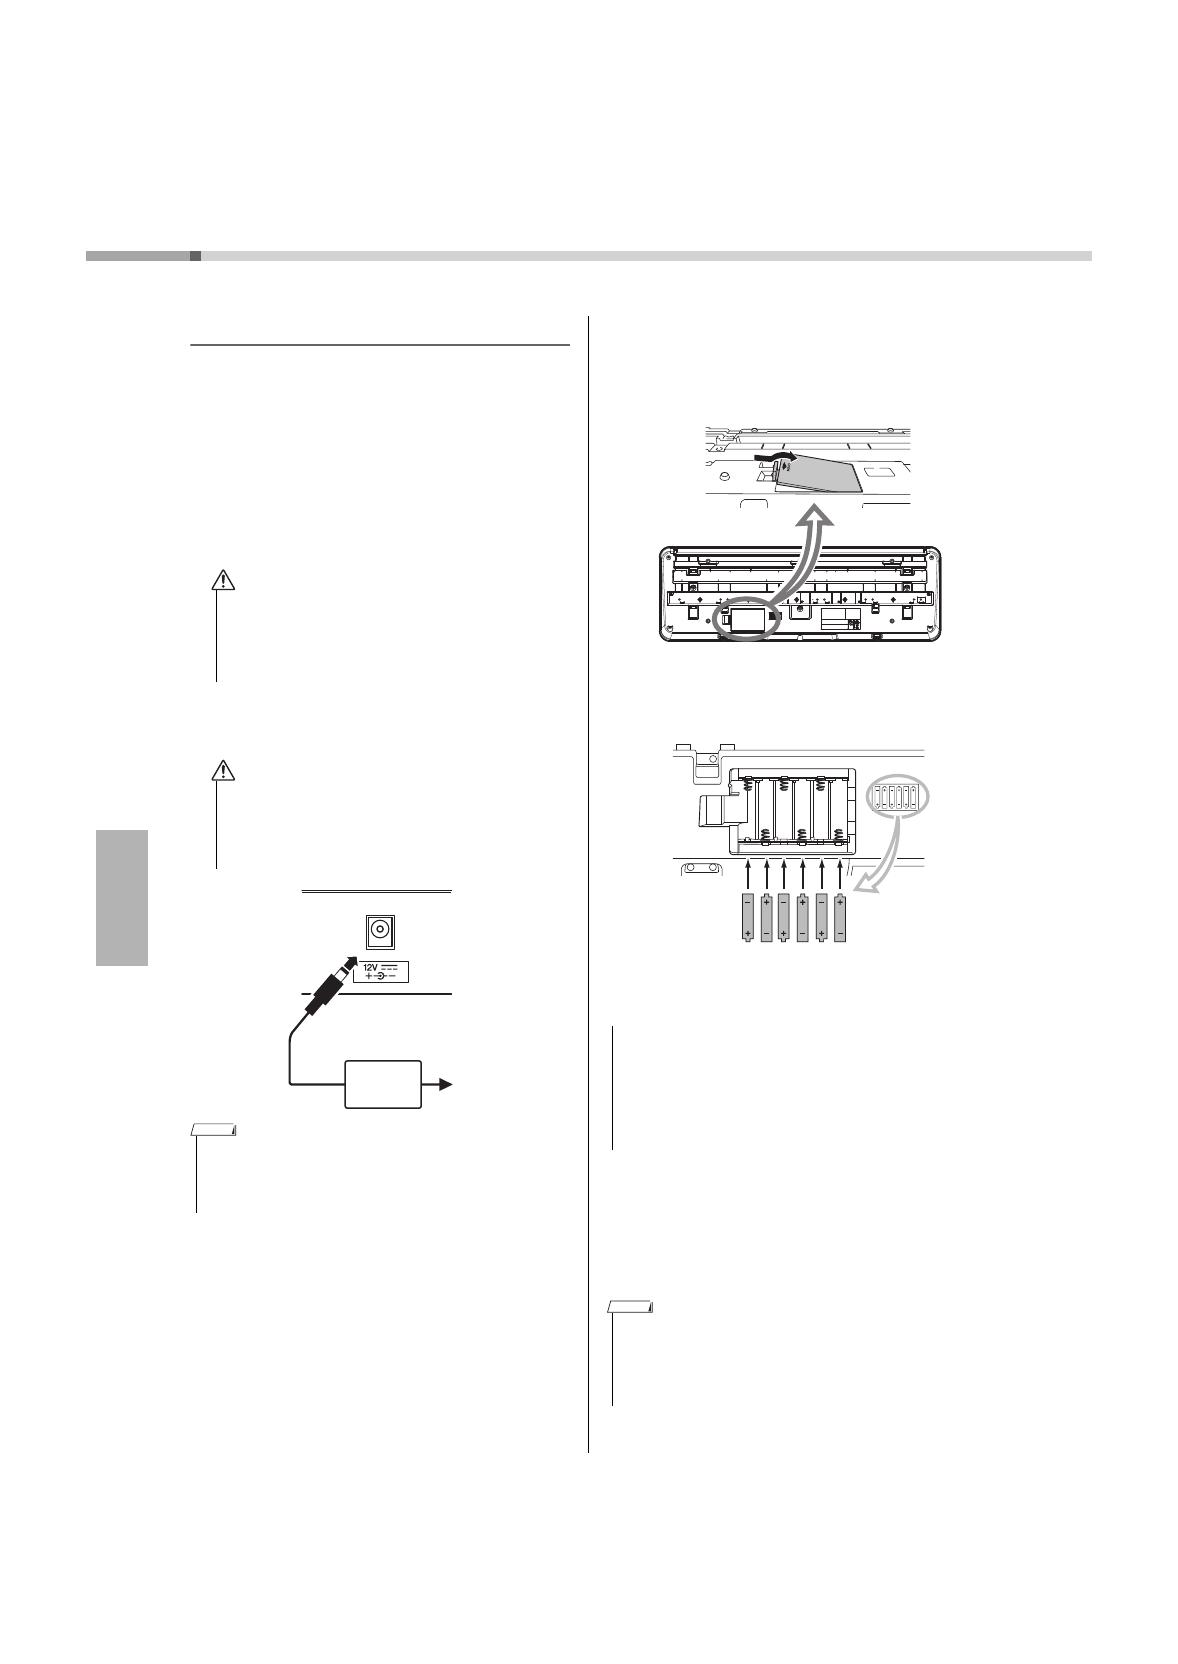 Installation, Alimentation, Utilisation d'un adaptateur